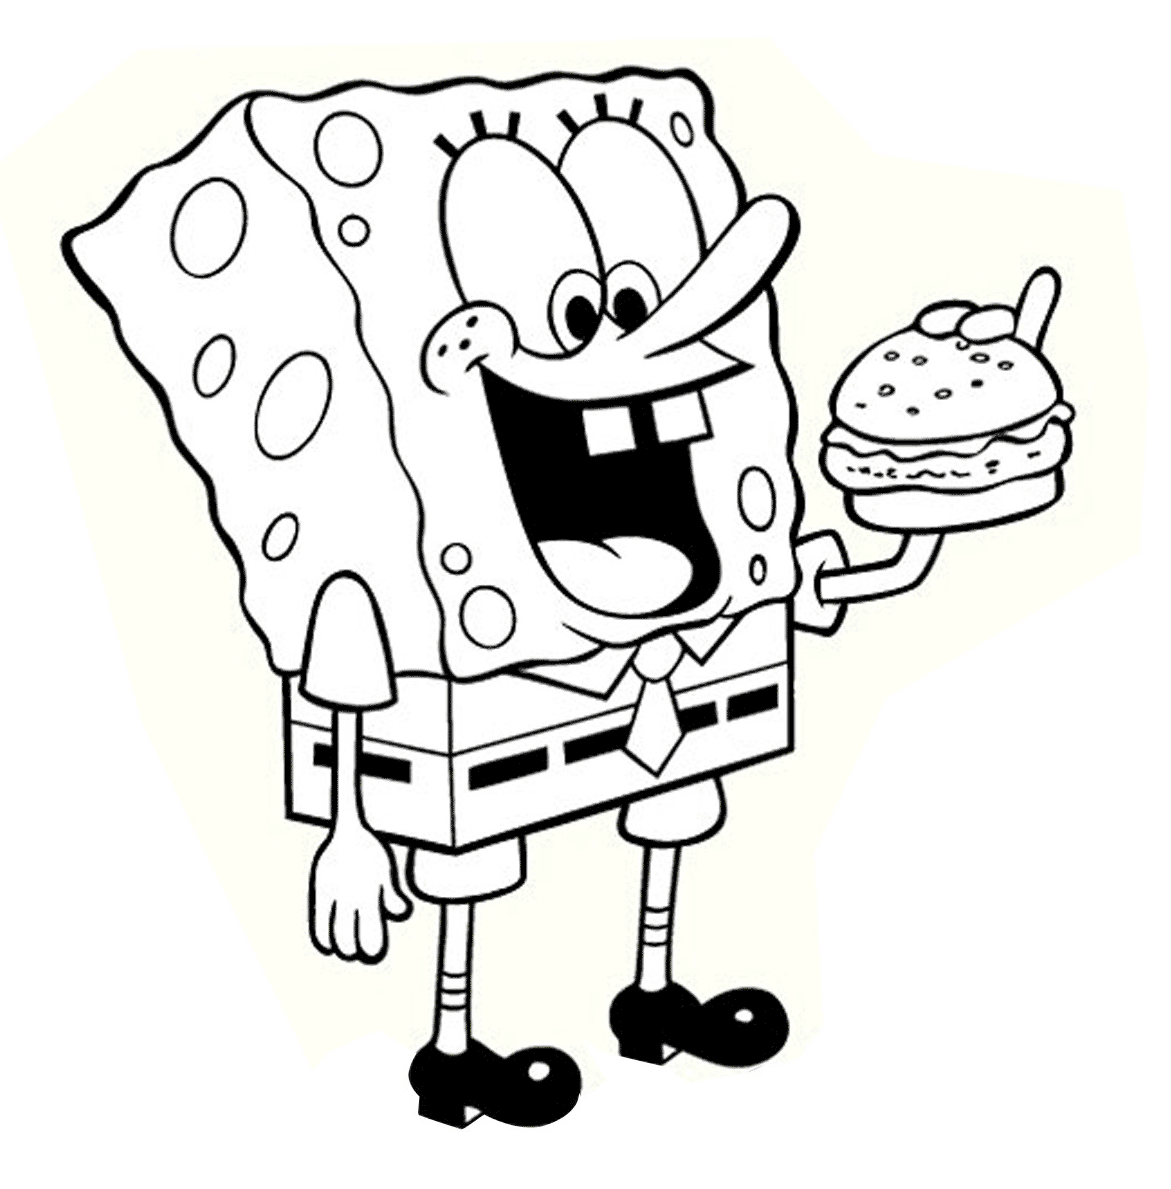 Gambar Mewarnai Spongebob Gambar Mewarnai Lucu